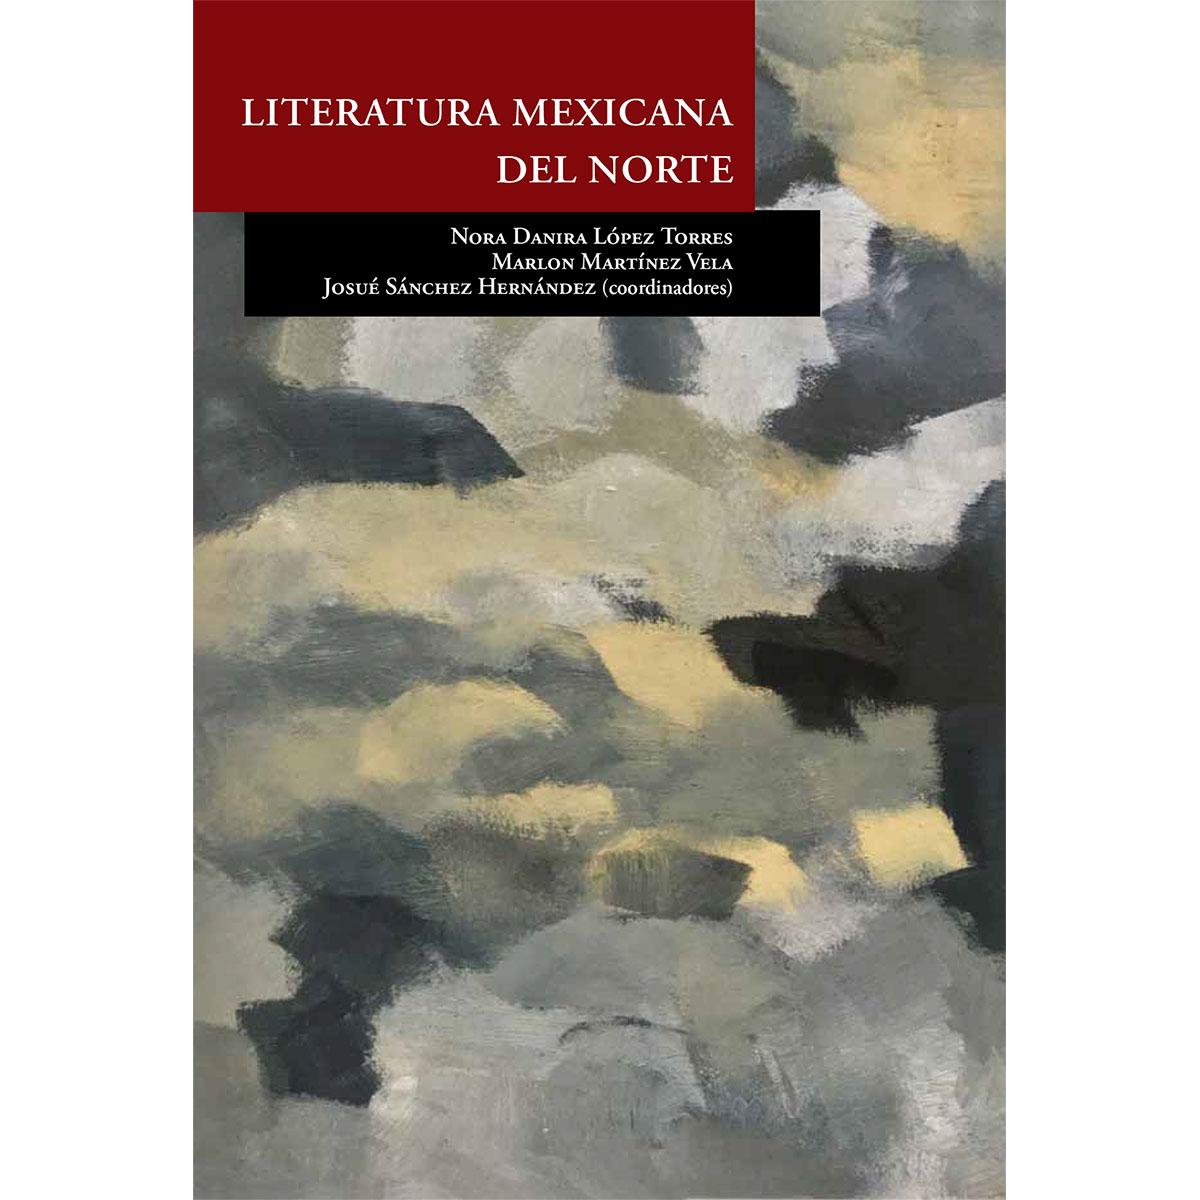 LITERATURA MEXICANA DEL NORTE